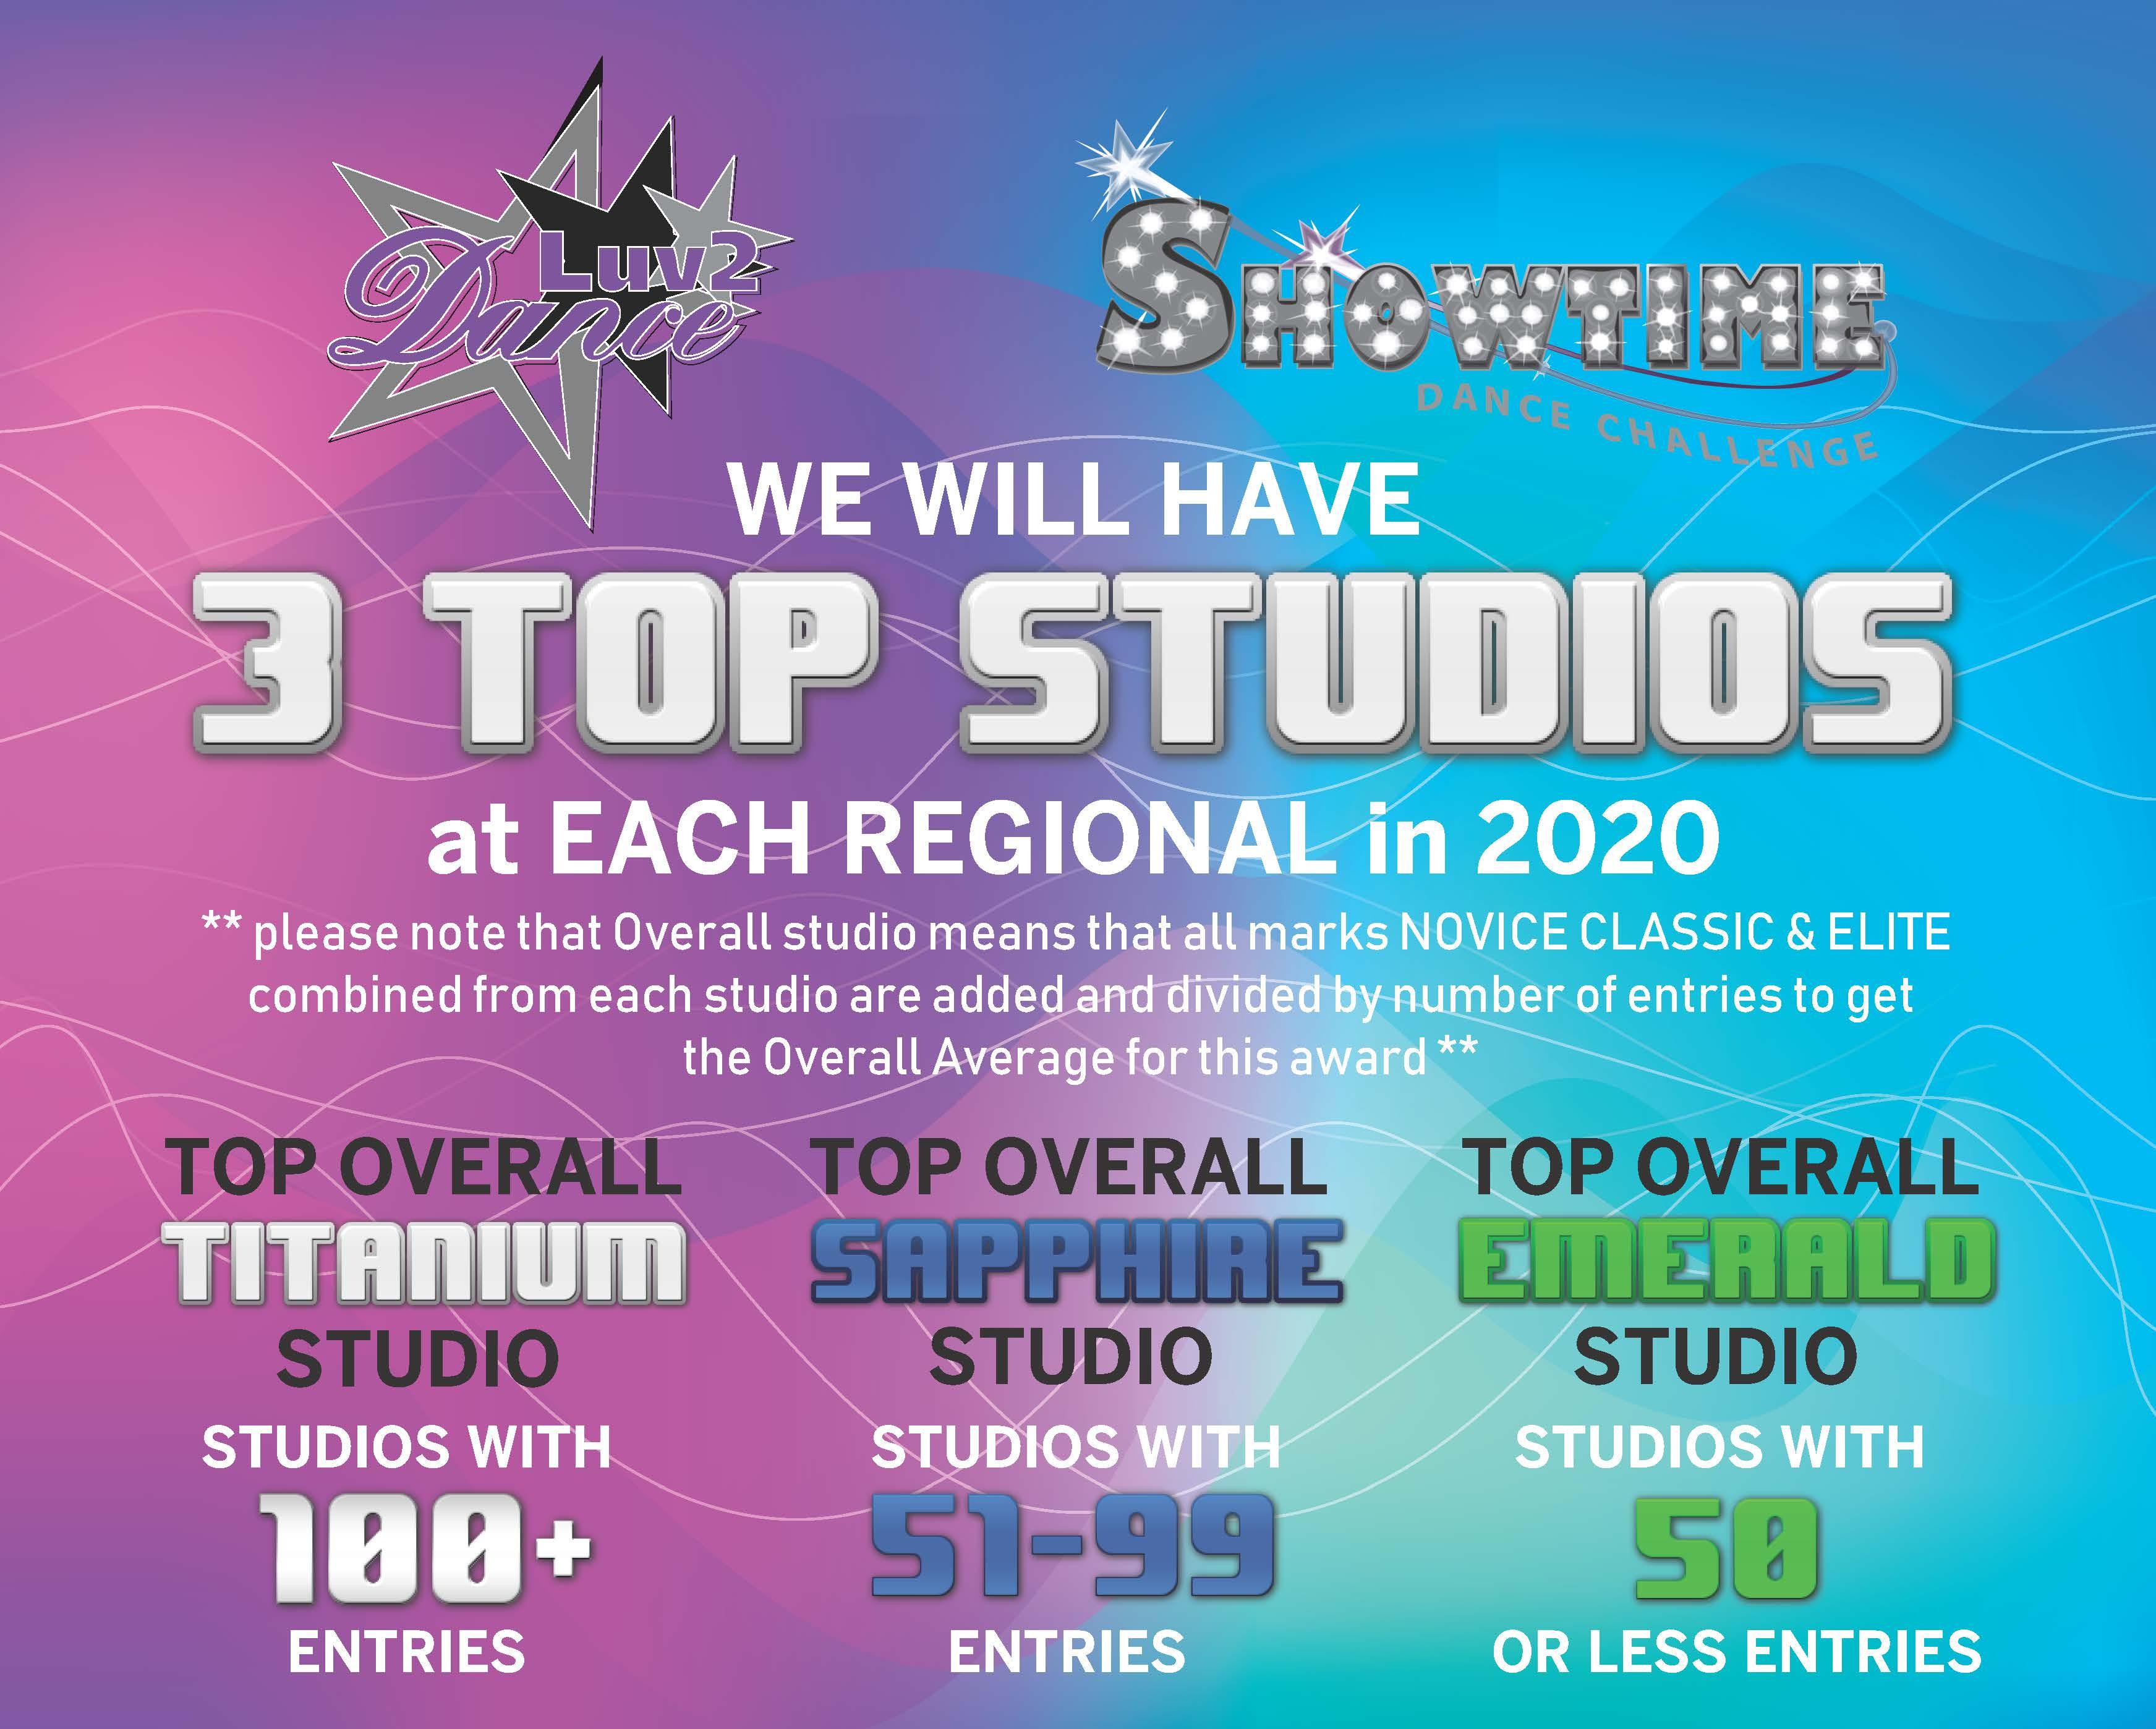 2020 top studios